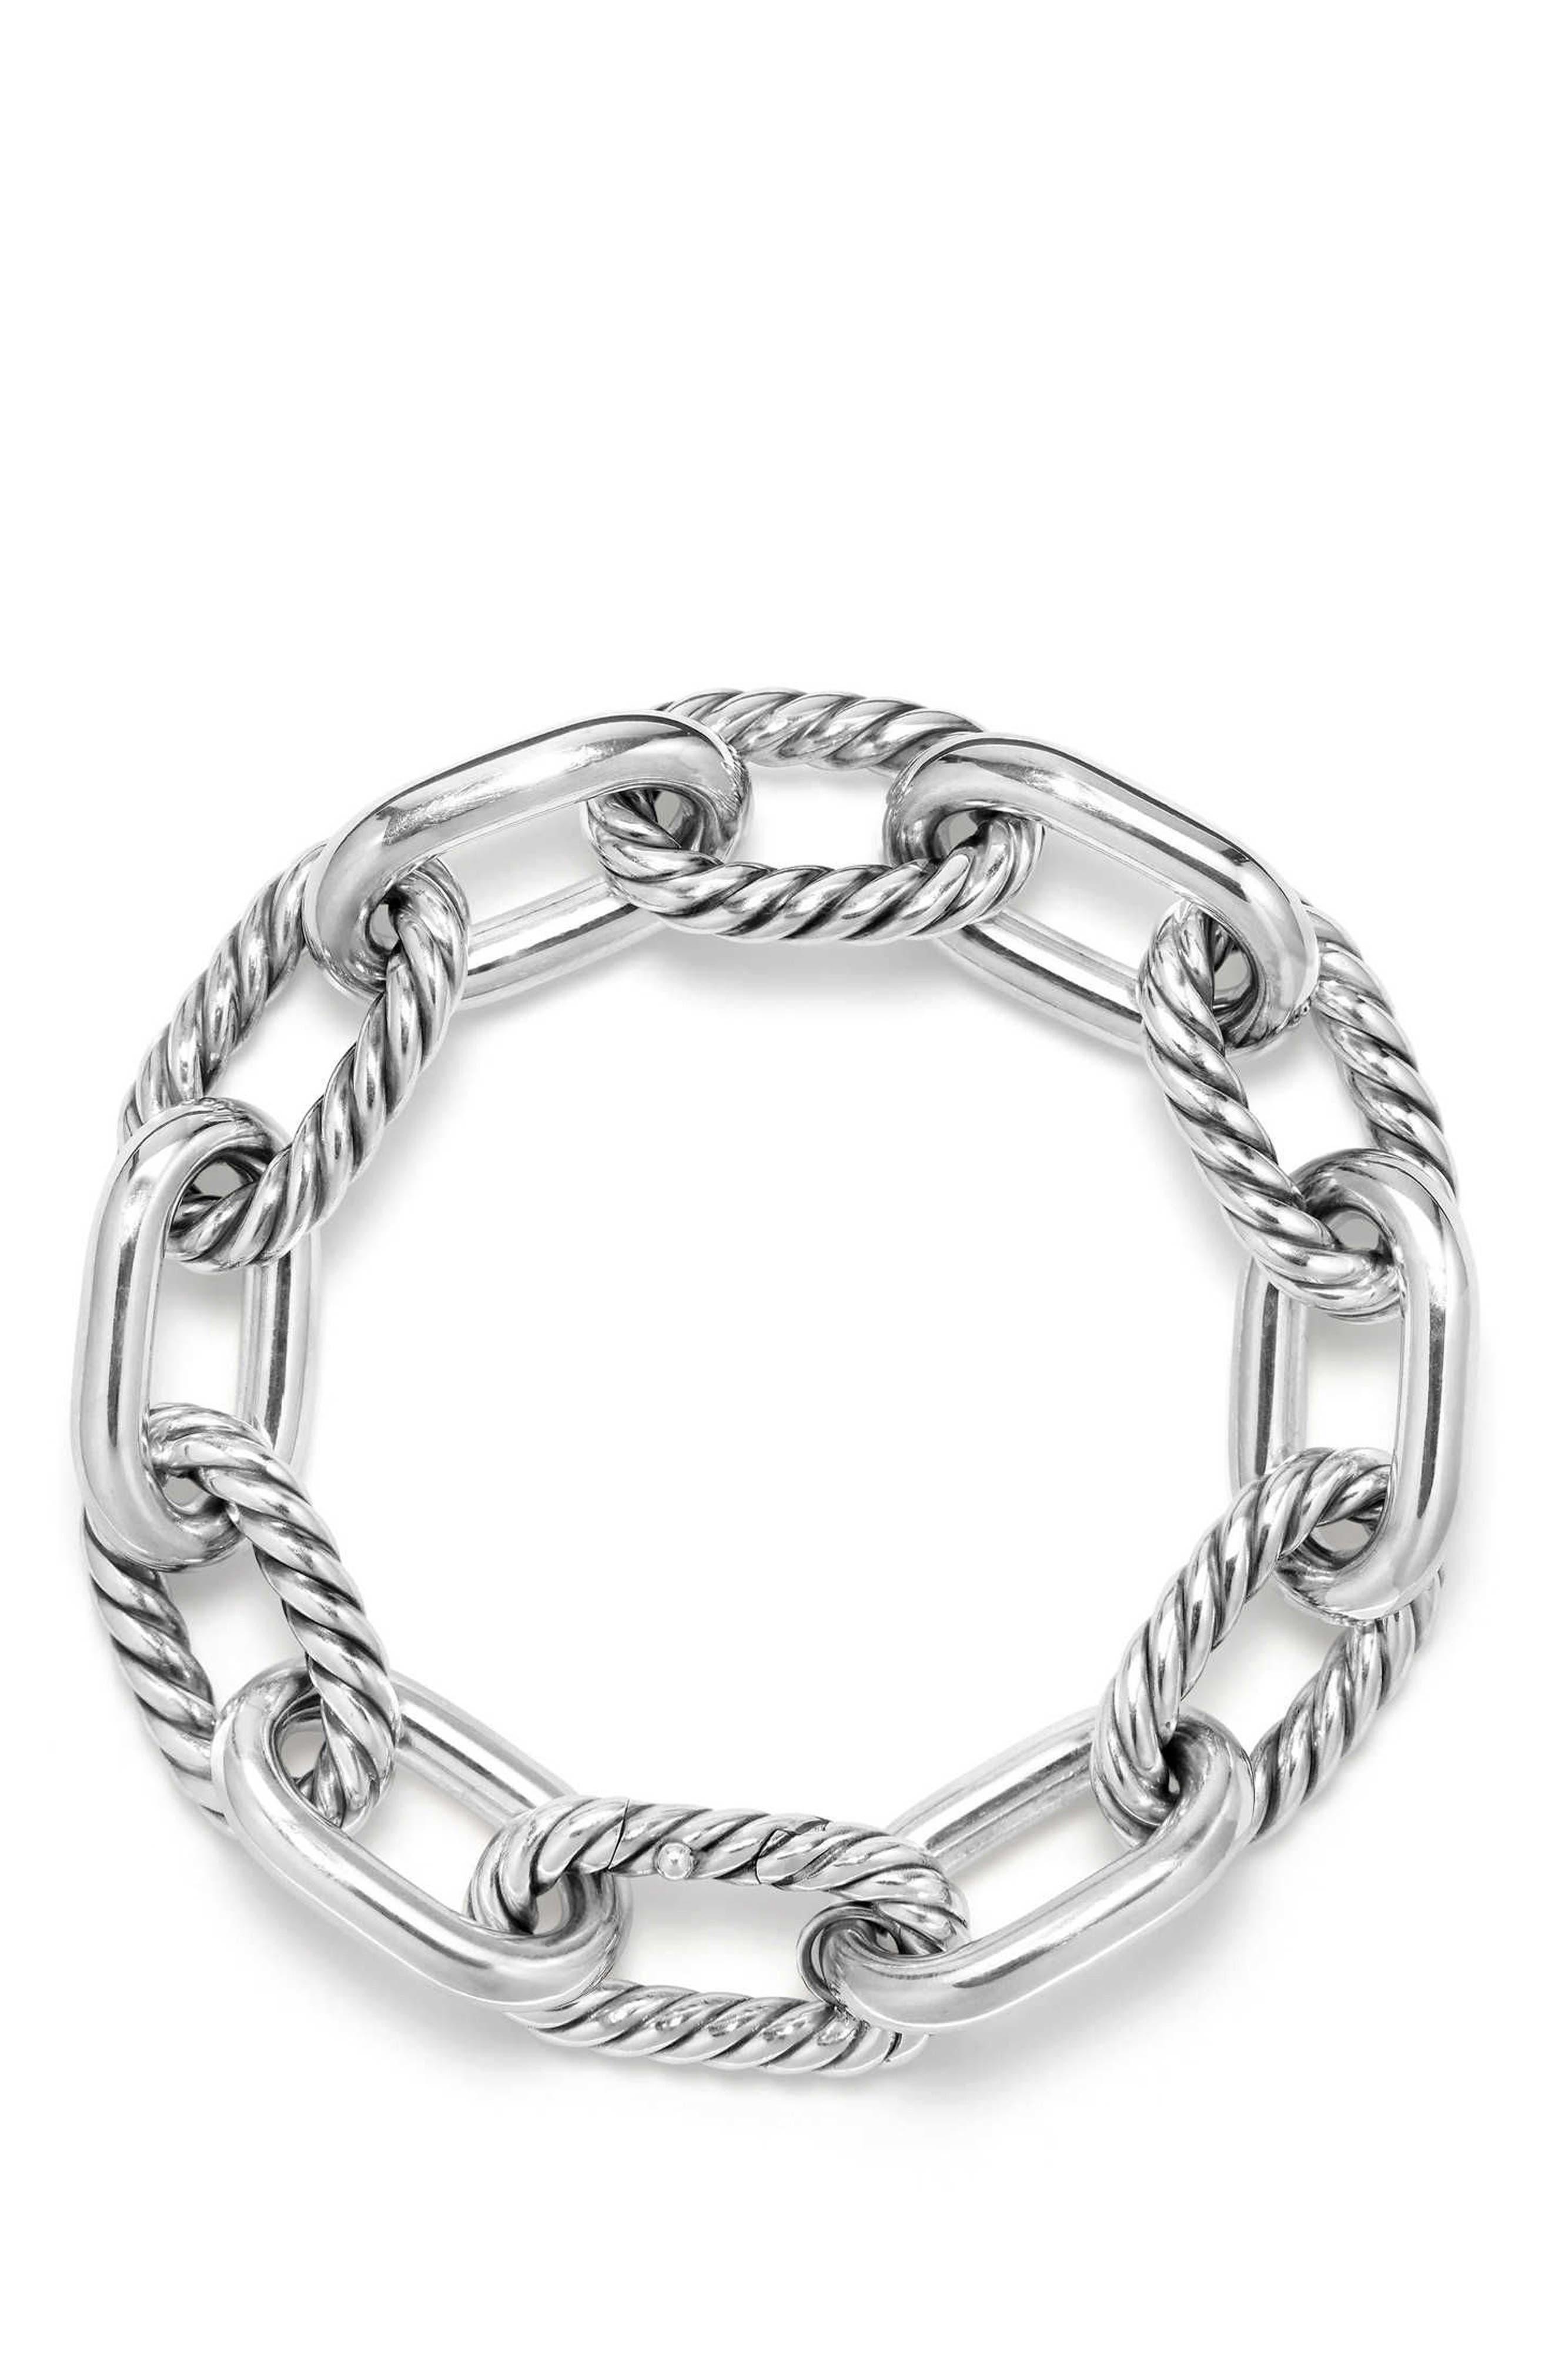 DY Madison Chain Large Bracelet,                             Alternate thumbnail 2, color,                             Silver